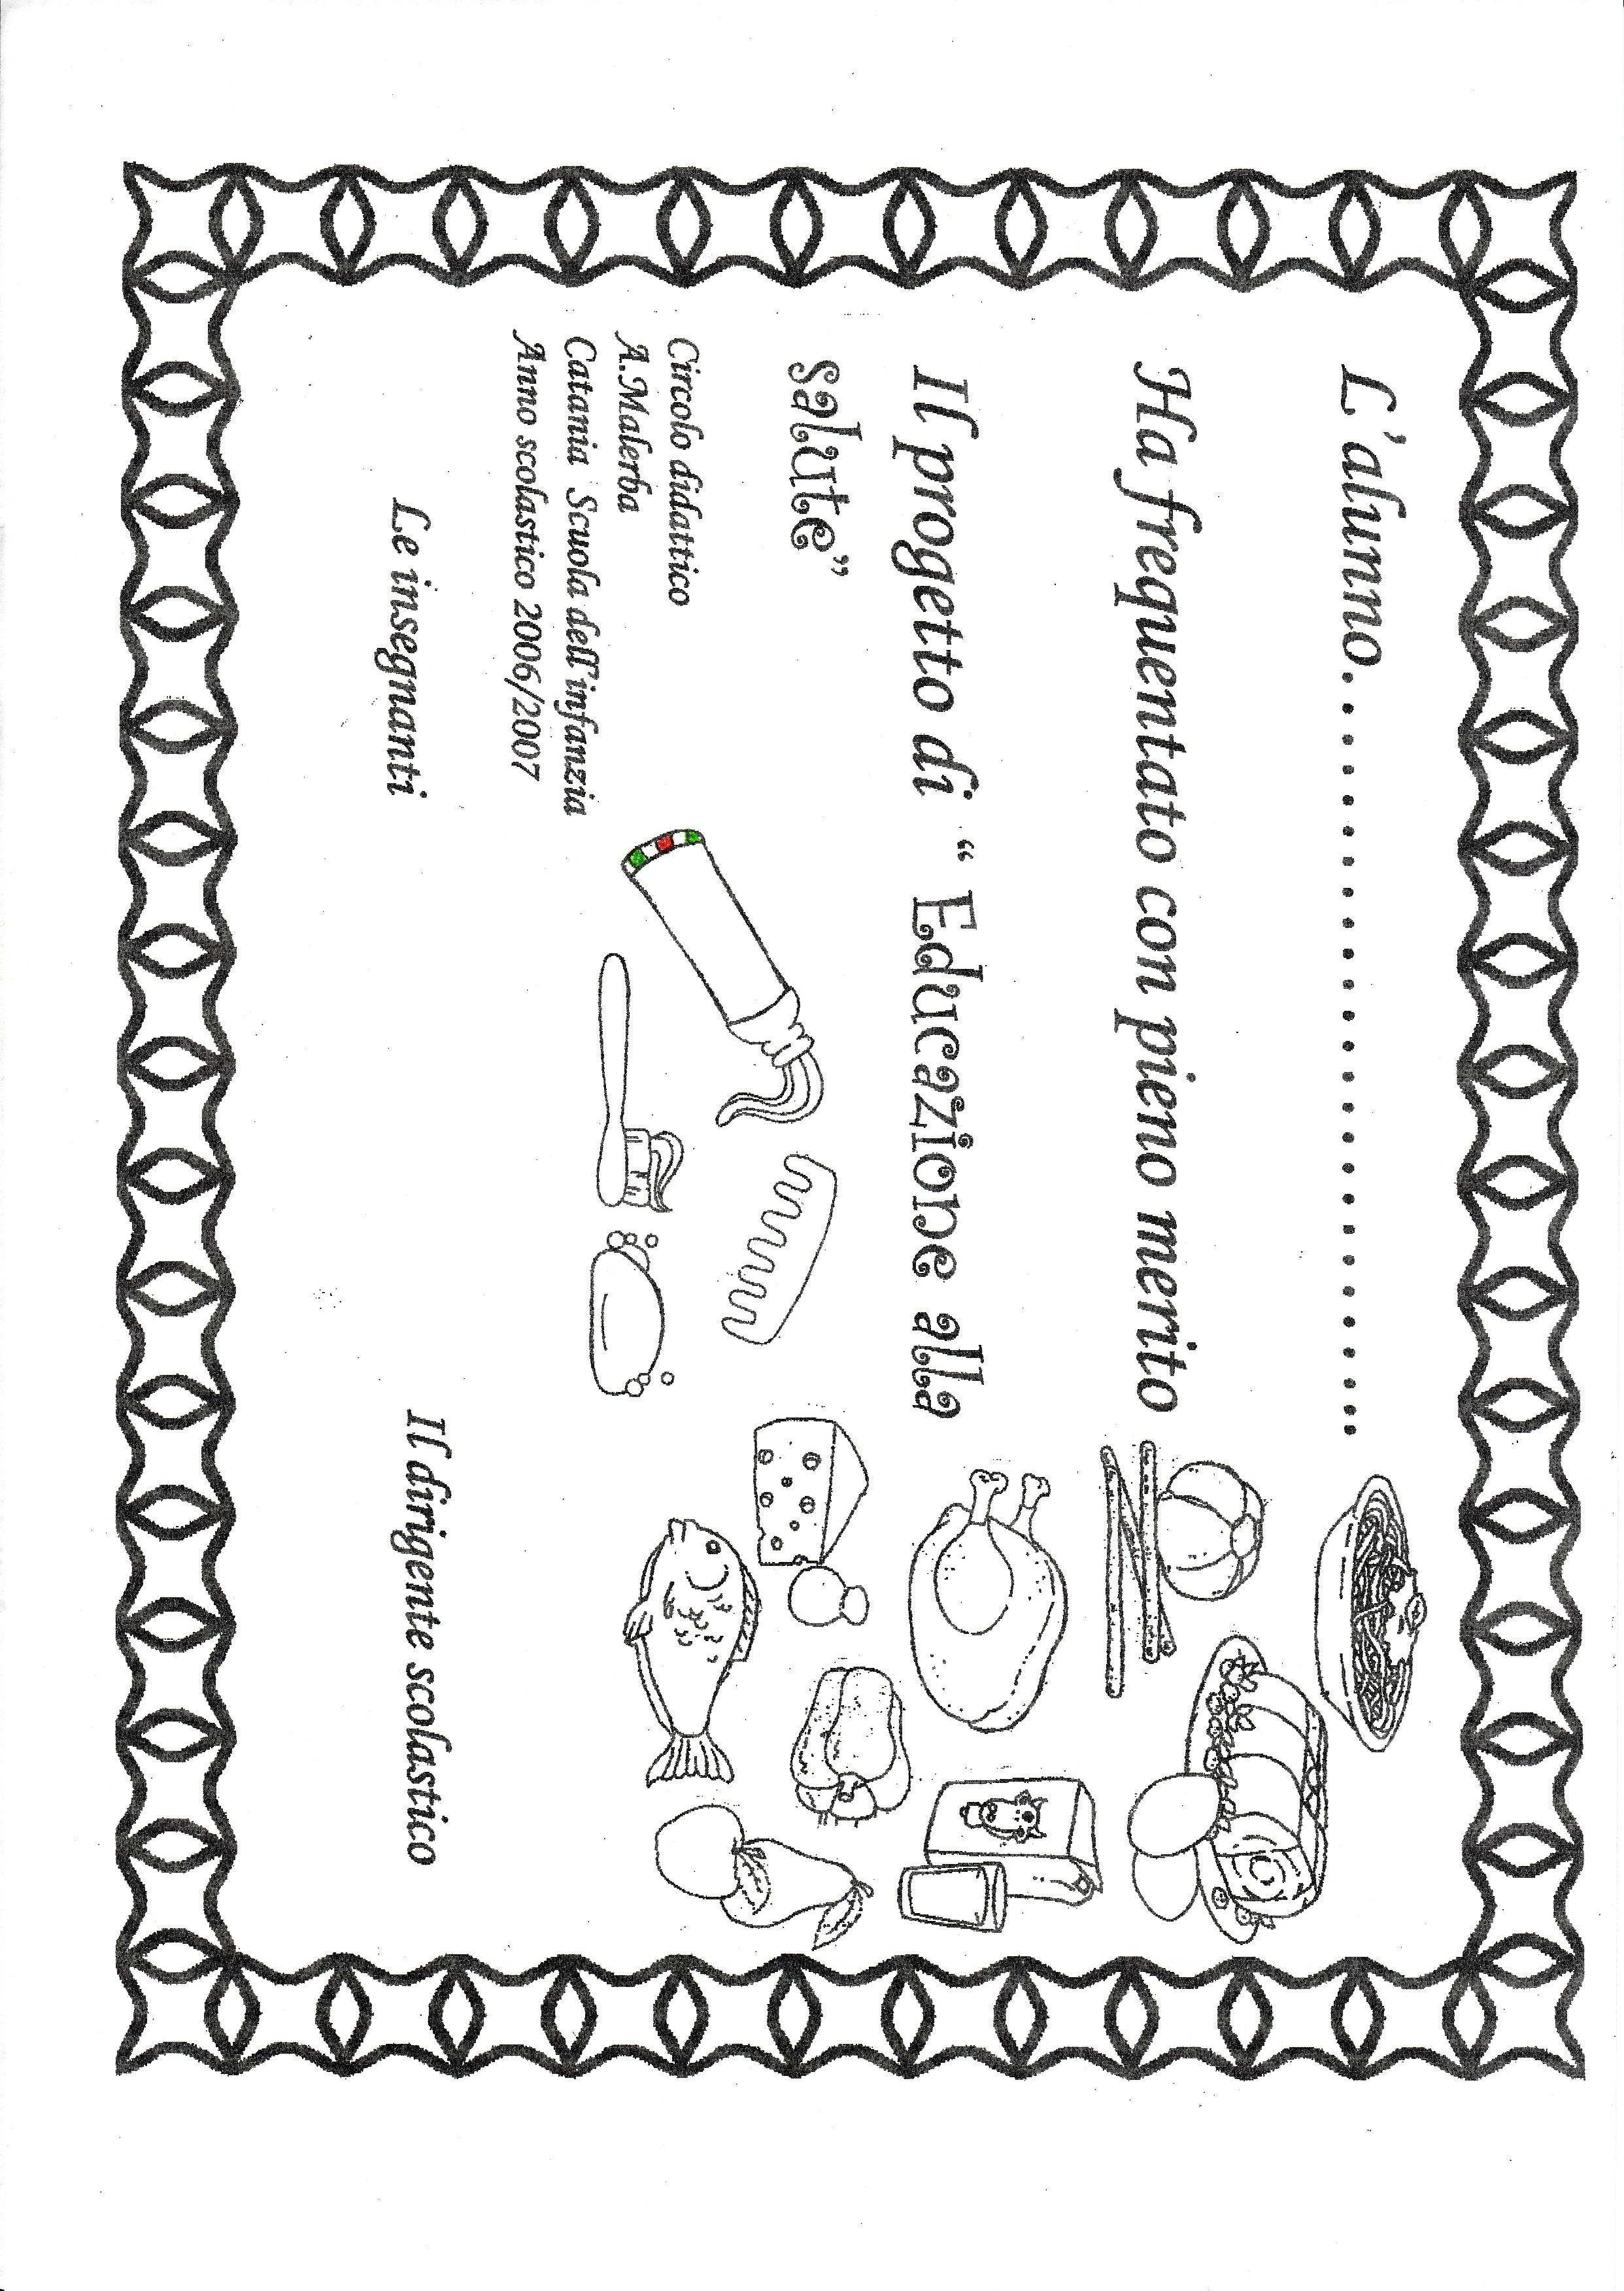 Ben noto Apparato Digerente Per Bambini Scuola Infanzia UK48 » Regardsdefemmes KD86